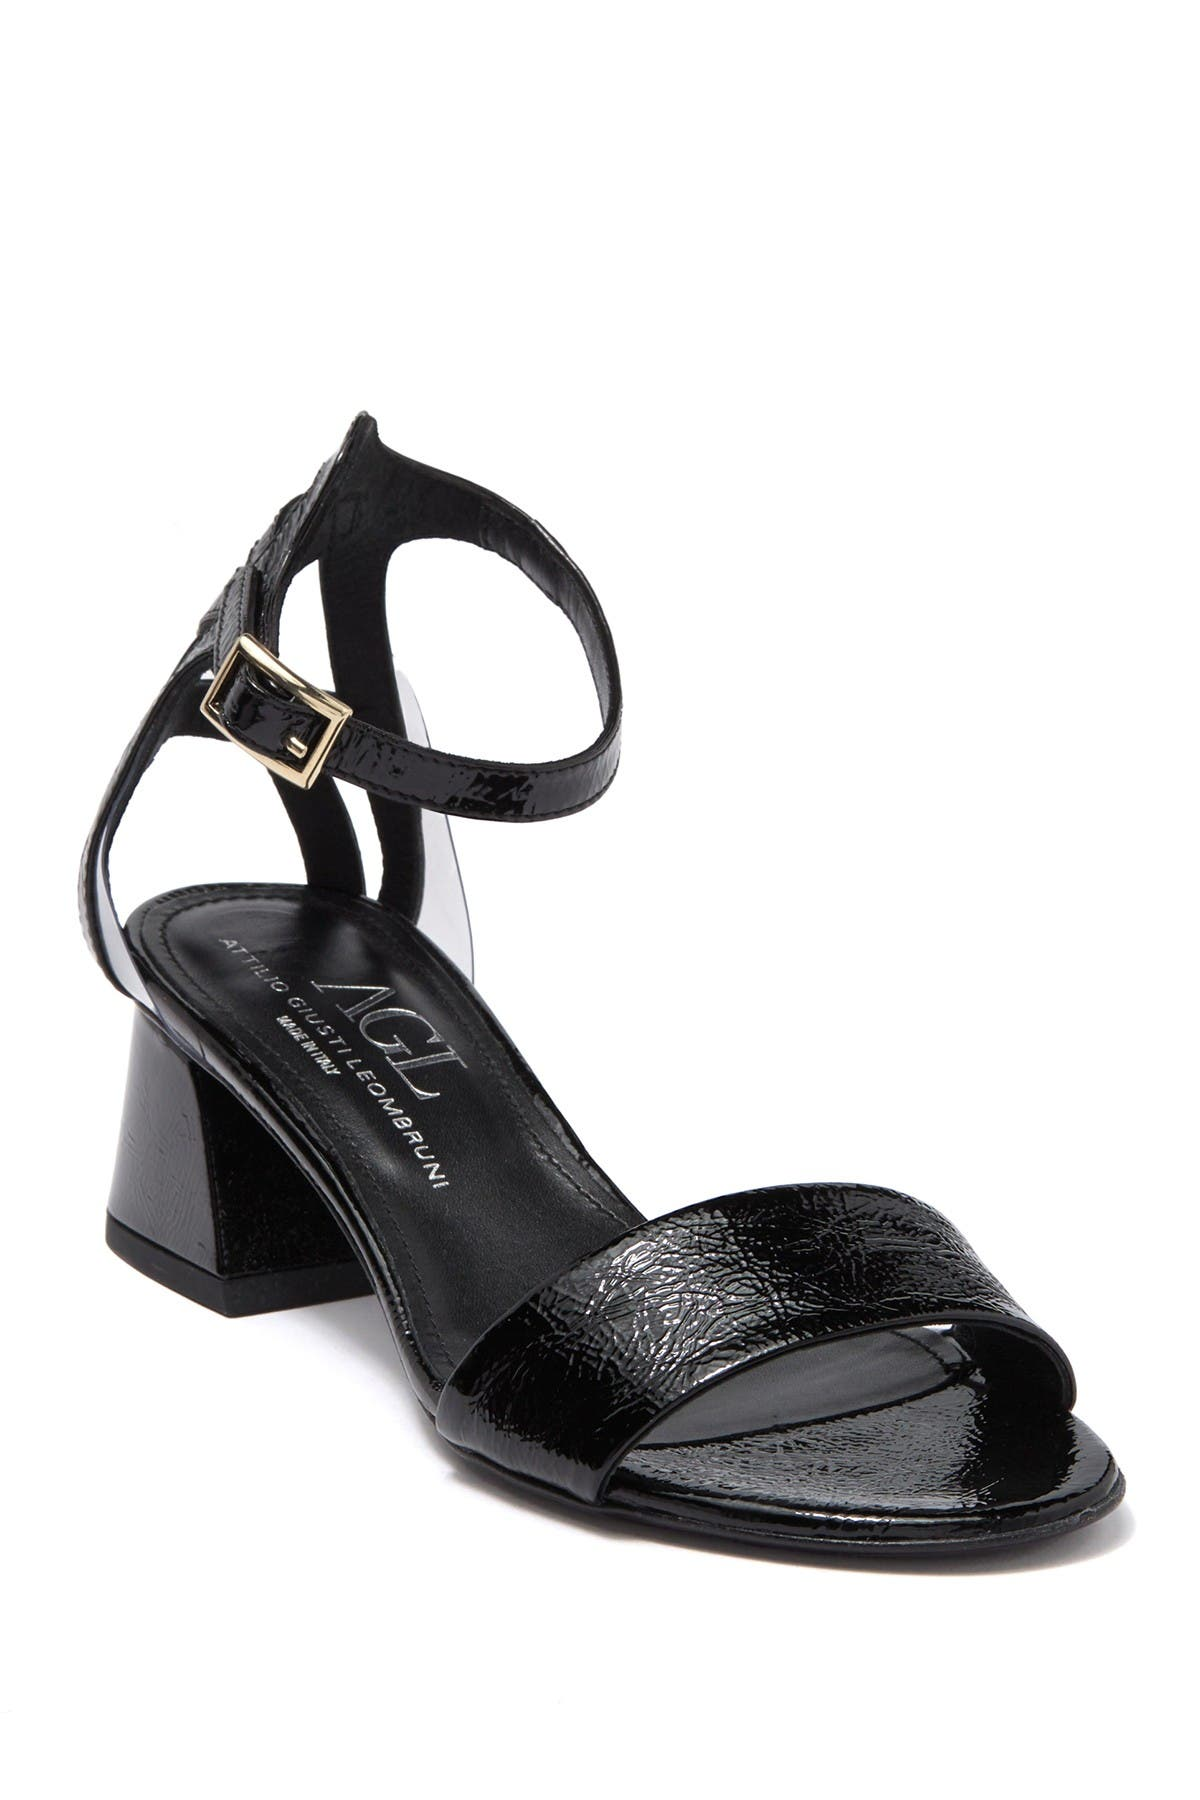 Image of AGL Patent Leather Block Heel Sandal